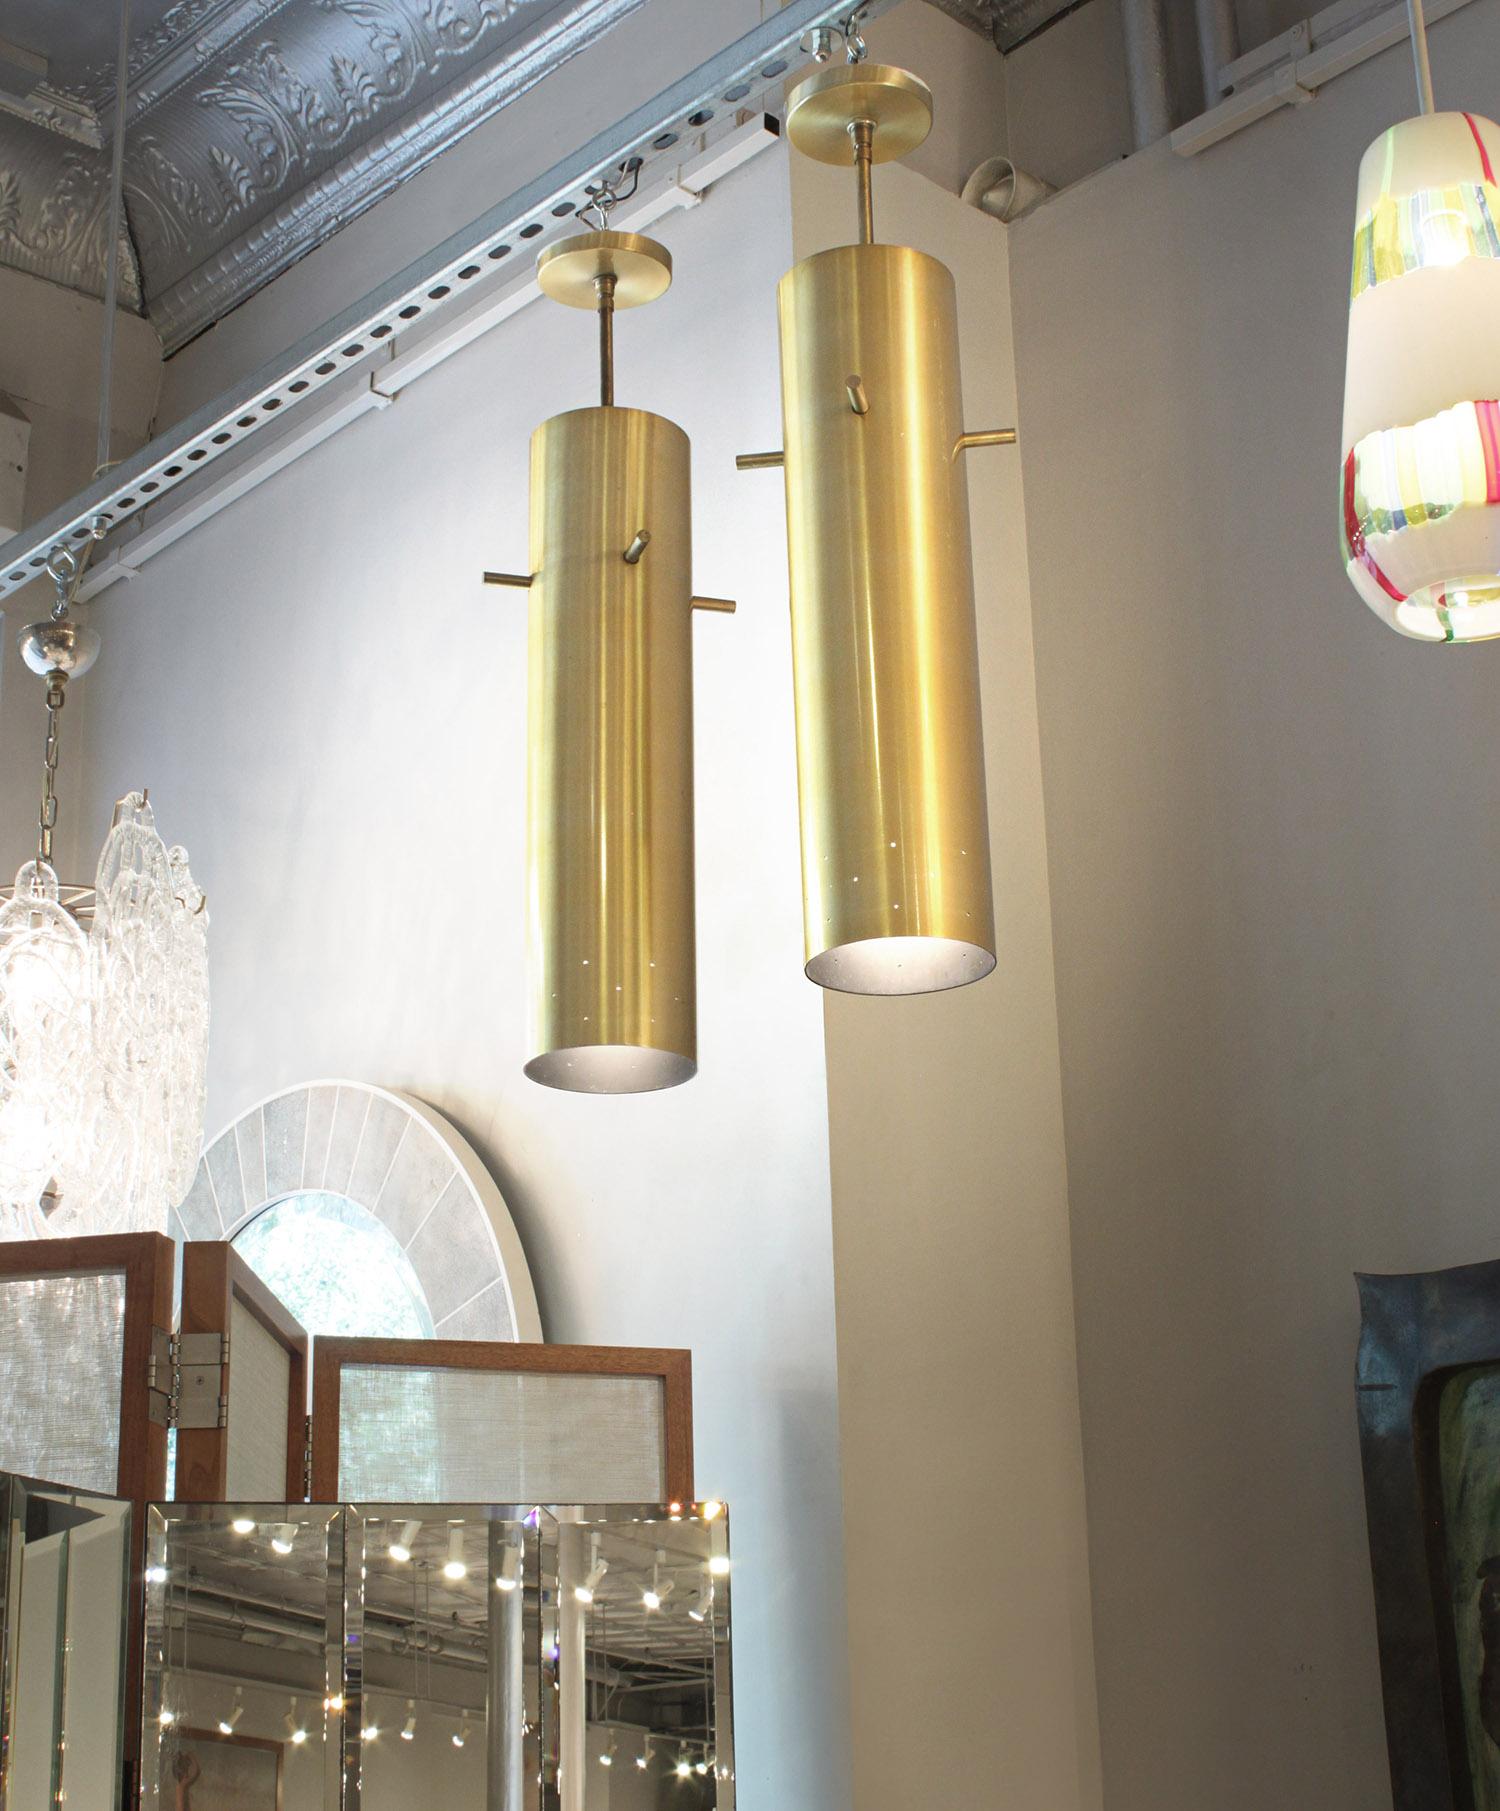 Lightolier 35 set5 brass pendants chandelier218 detail6 hires.jpg